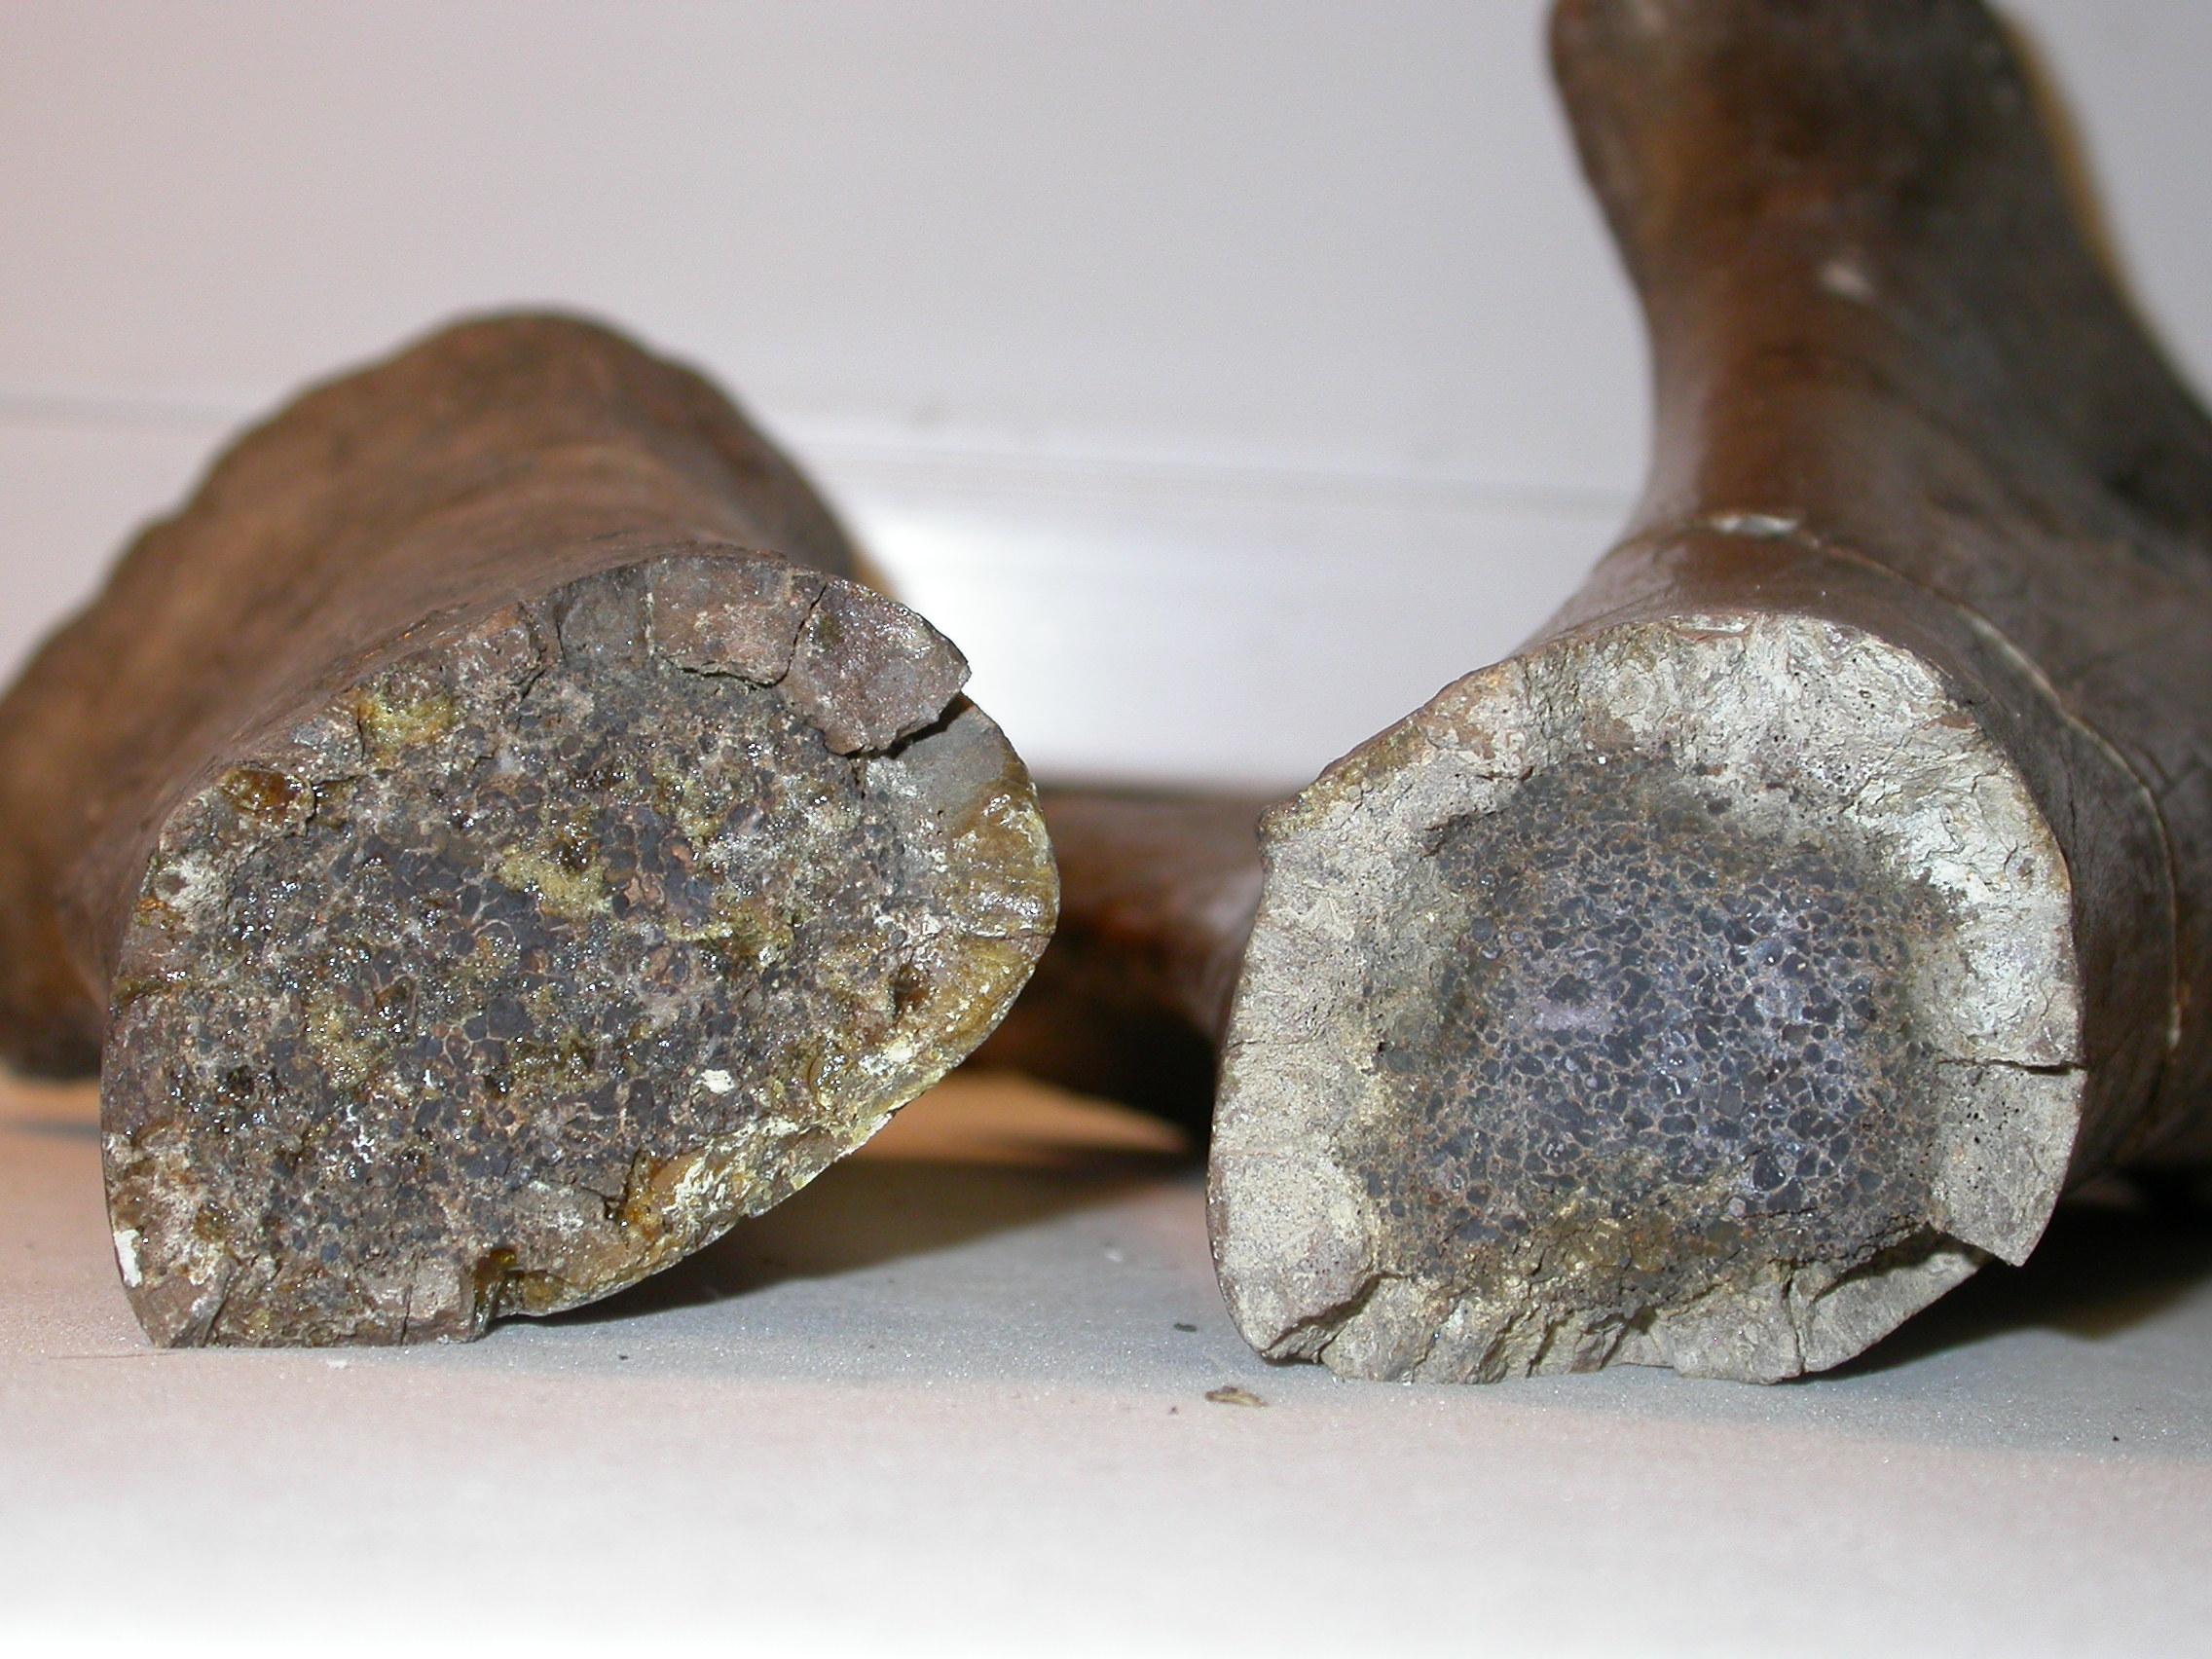 Breakage in bones of the lower left forelimb of